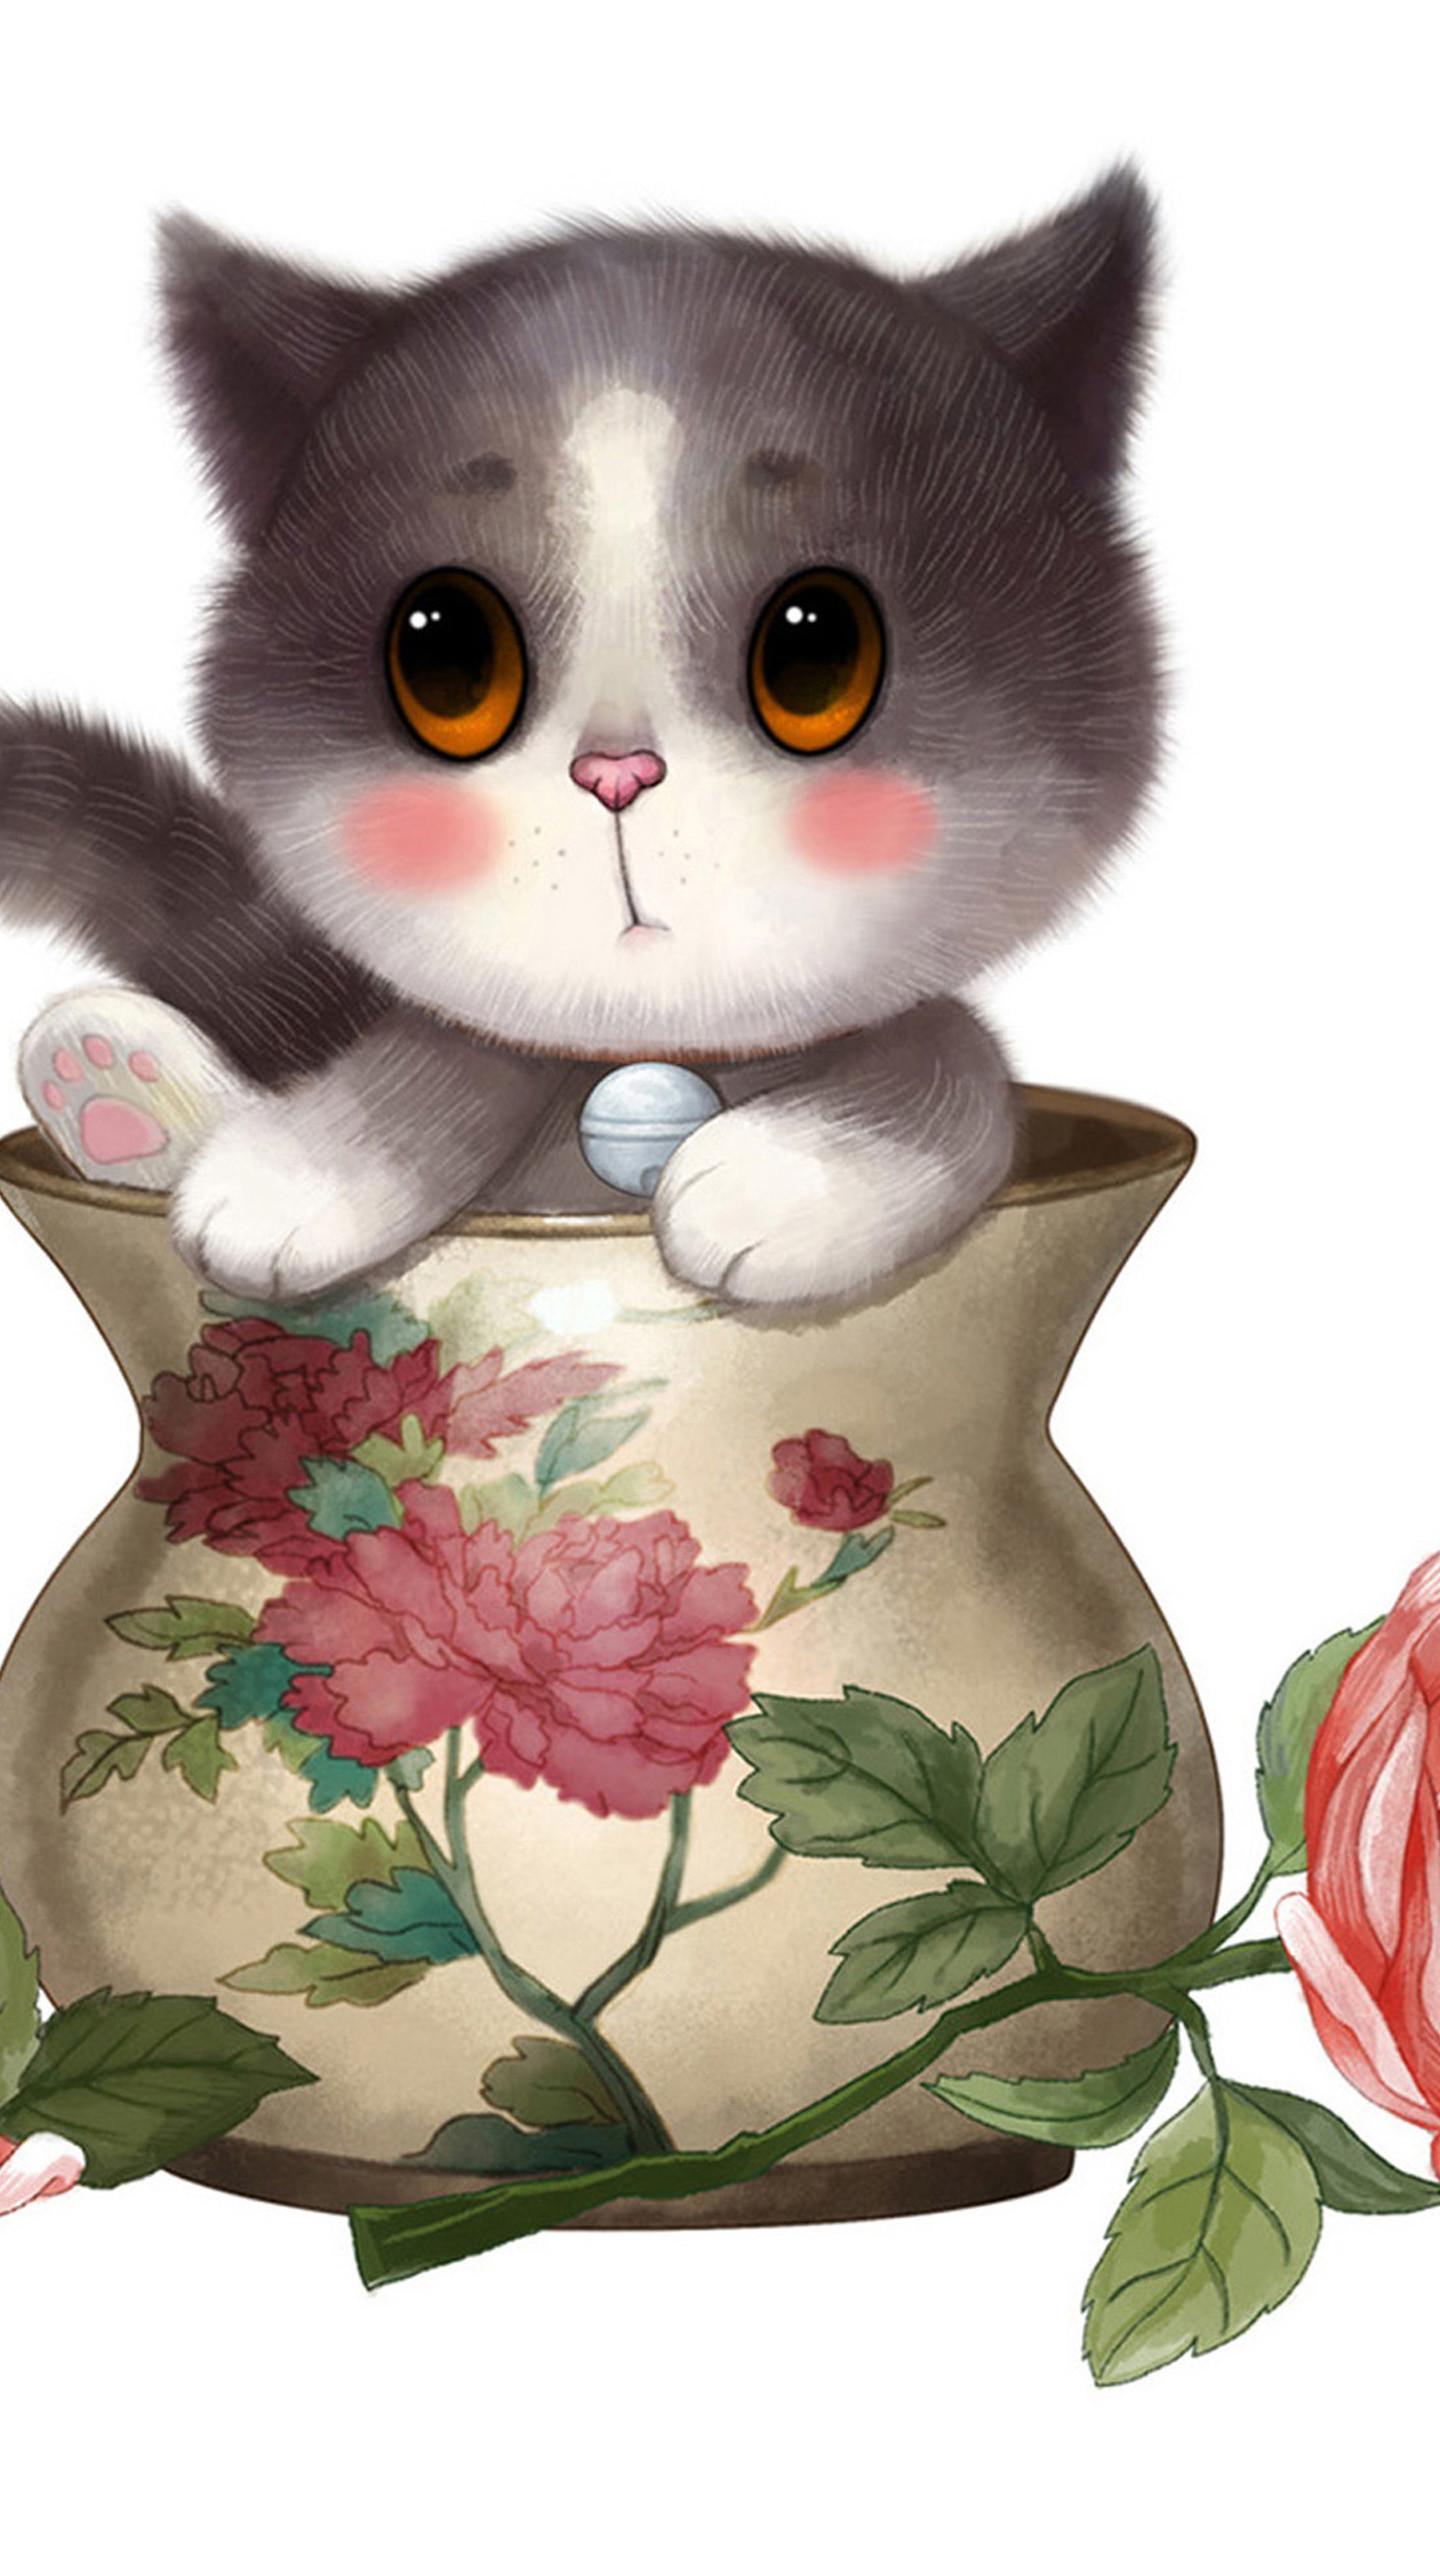 1920×1080 px; 6125958 Cute Cartoon Cat, LifeWallpapers Graphics